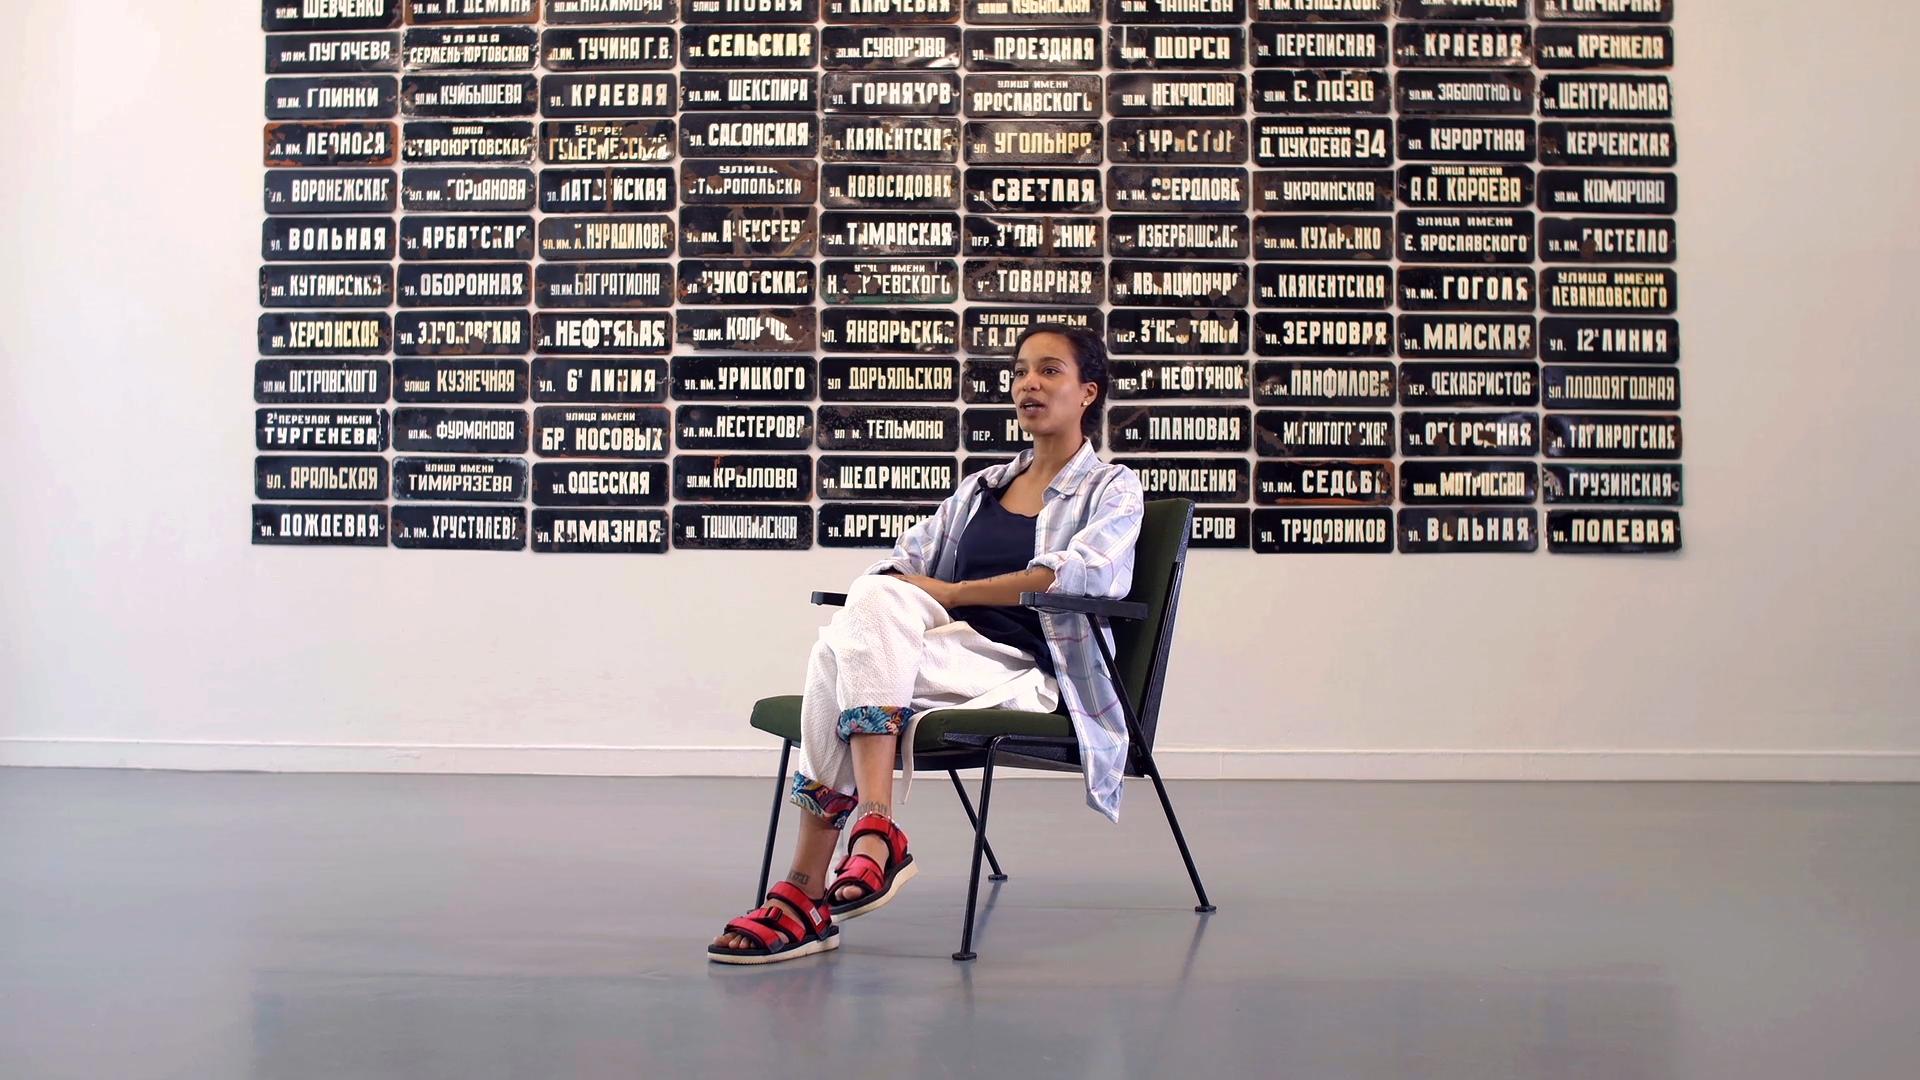 Yoji_Interview_V6